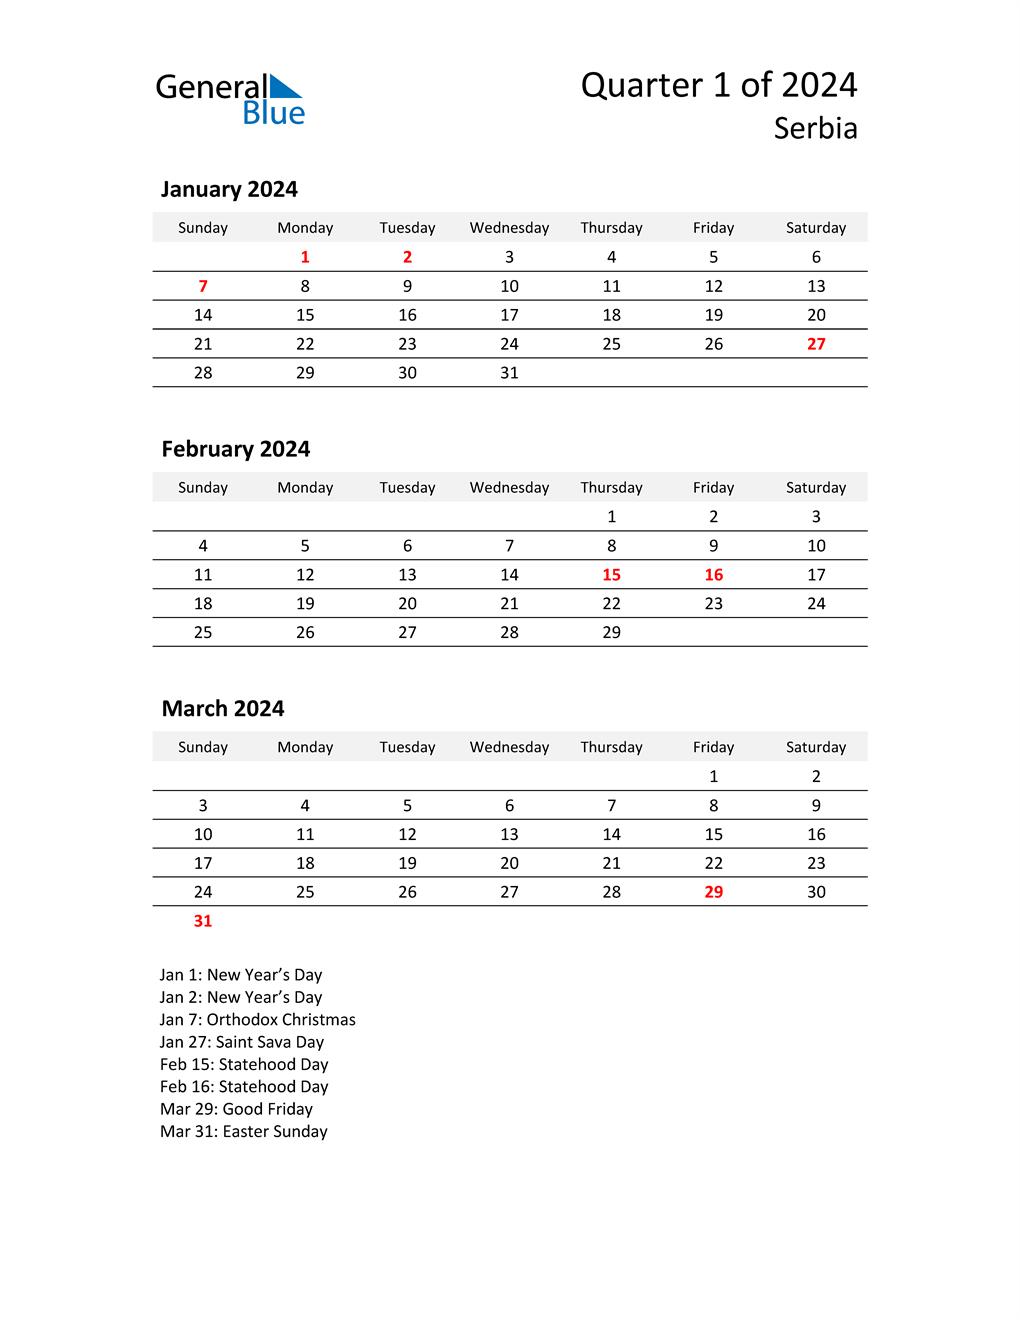 2024 Three-Month Calendar for Serbia